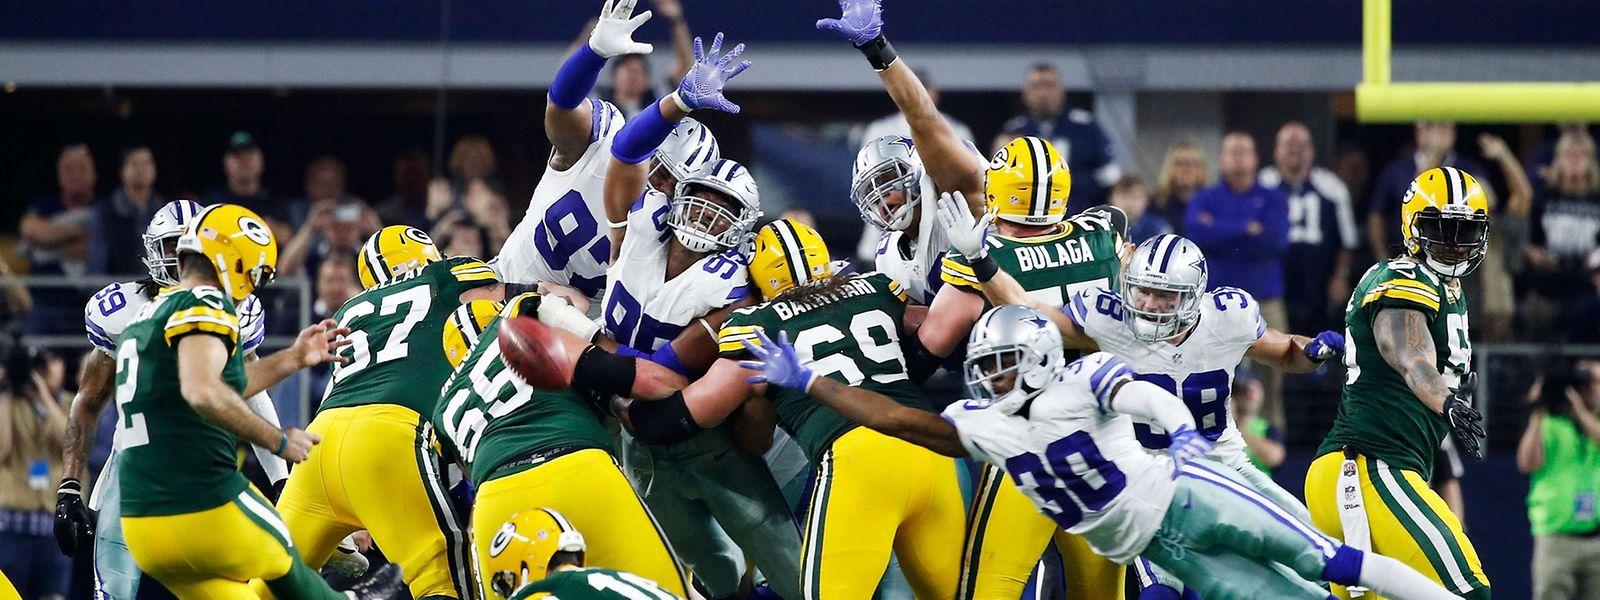 Die Green Bay Packers stehen im Play-off-Halbfinale der National Football League.